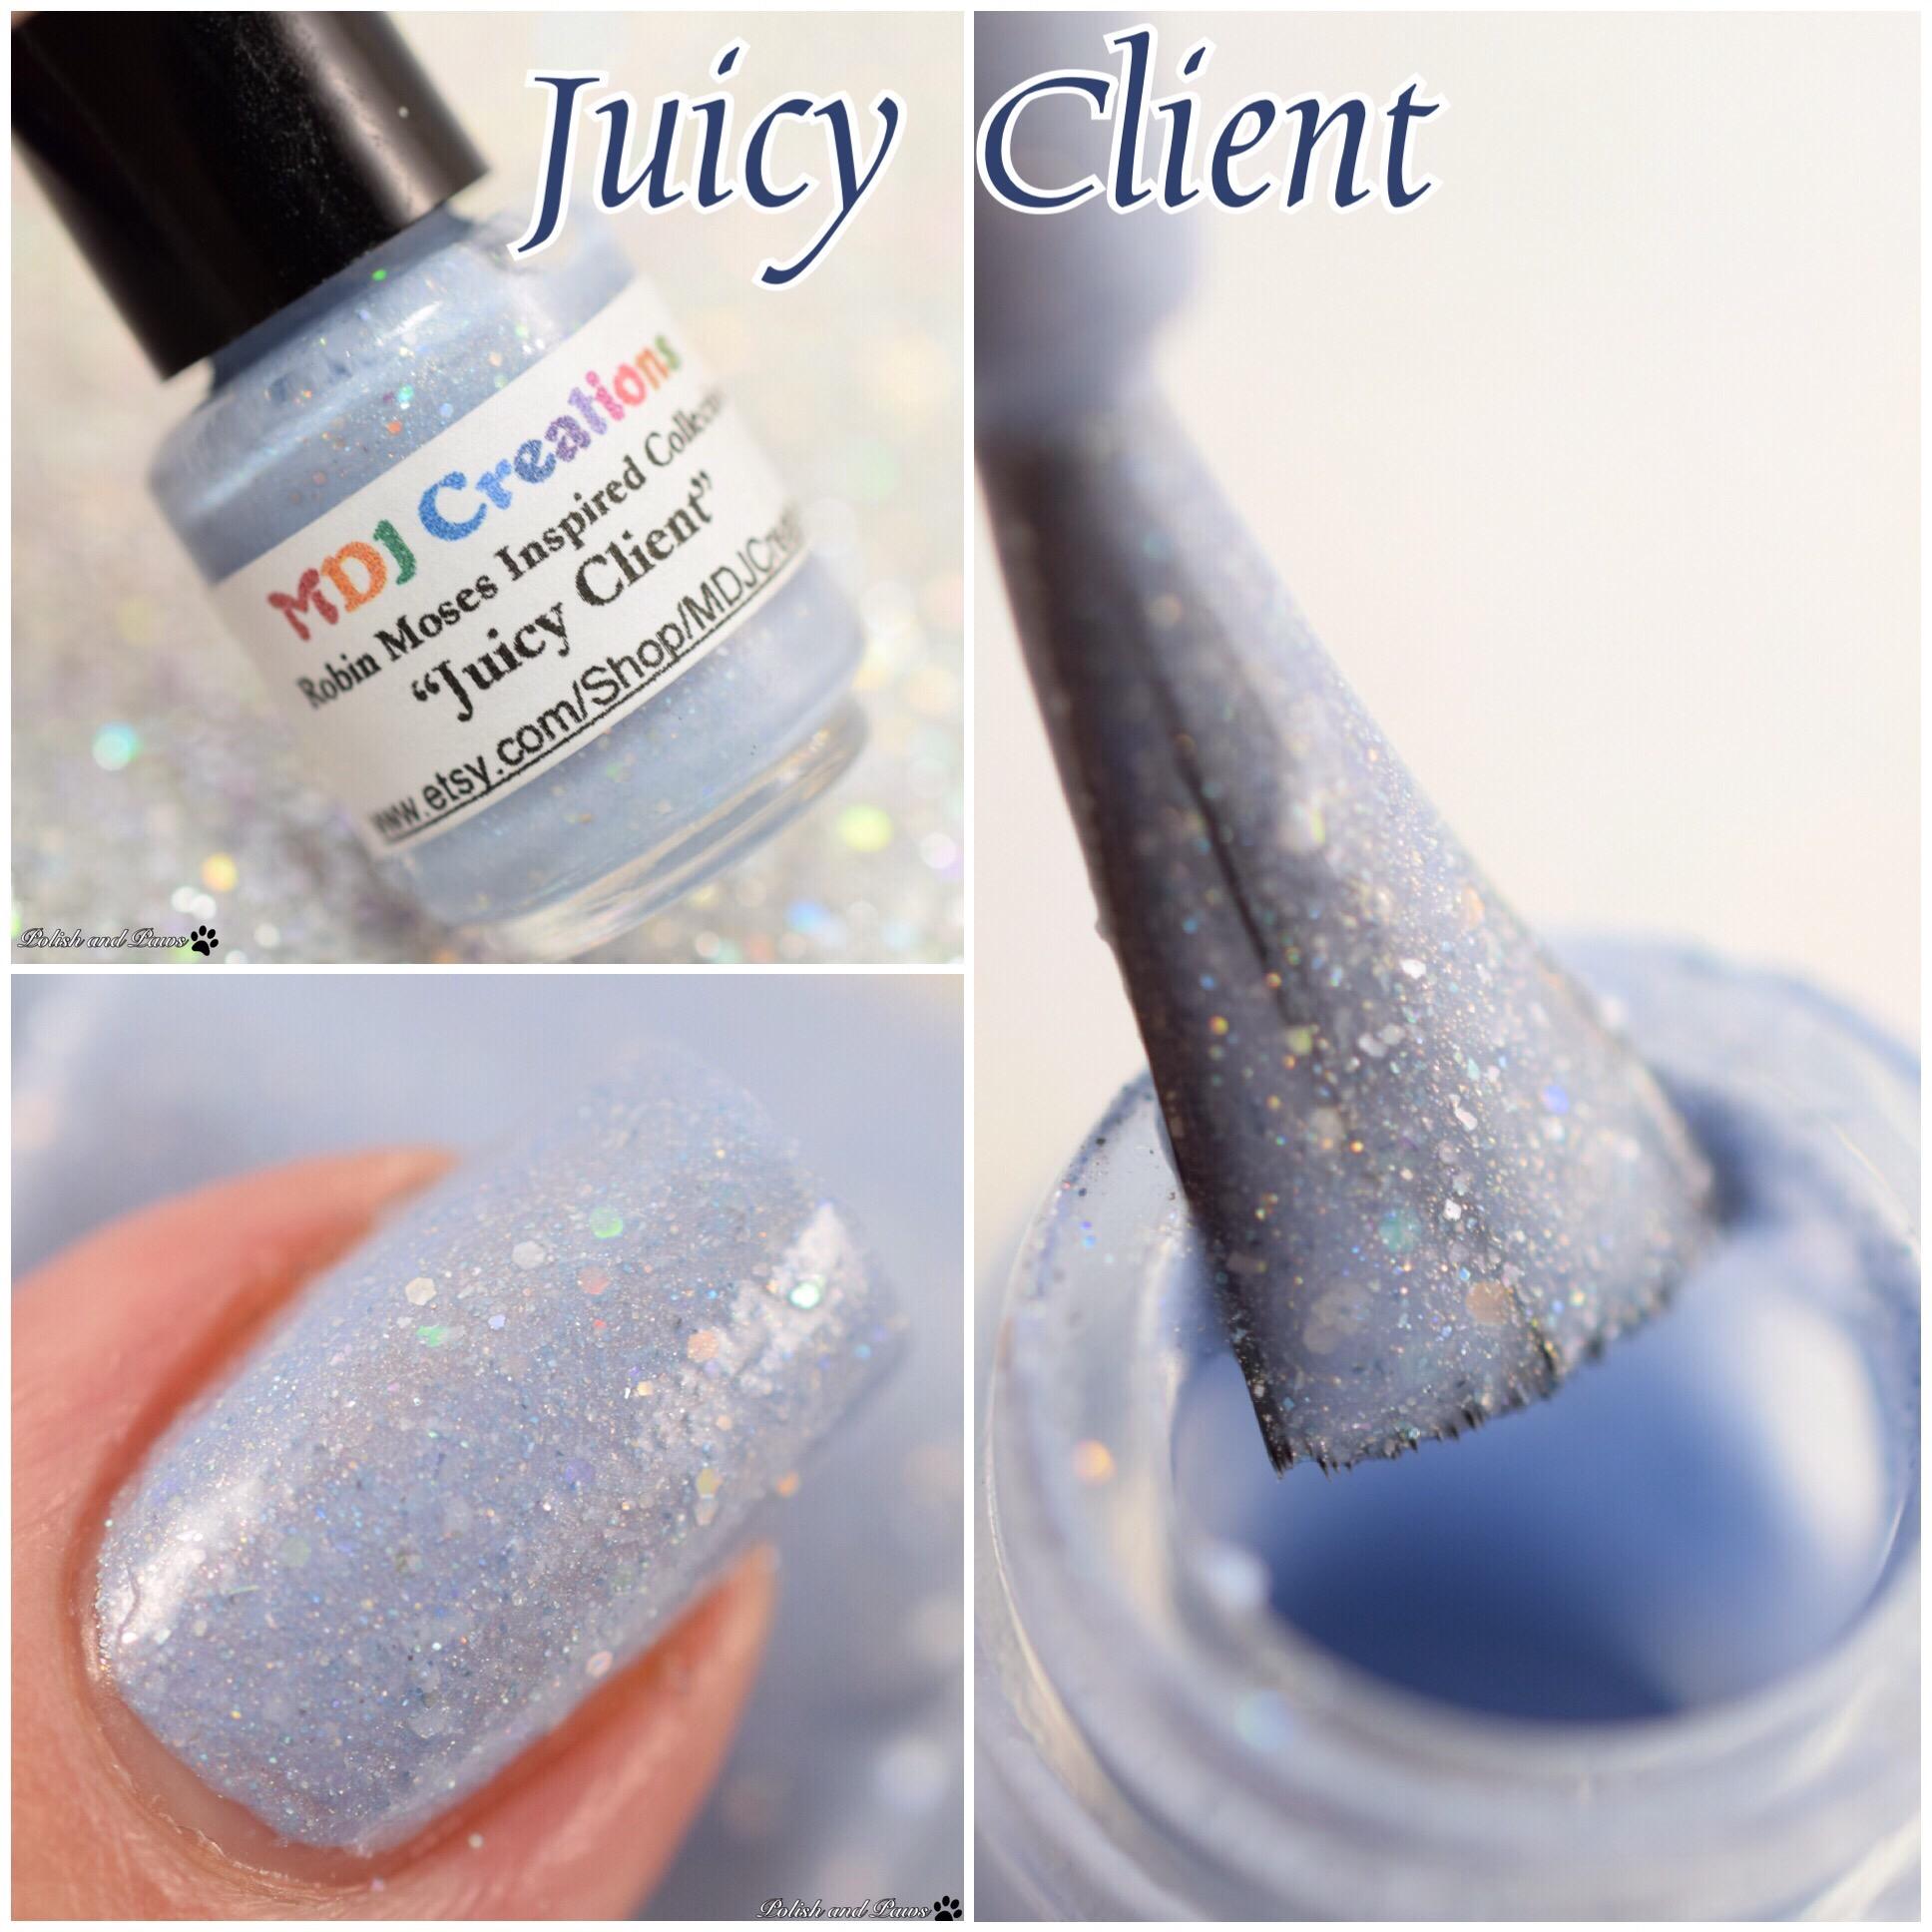 MDJ Creations Juicy Client